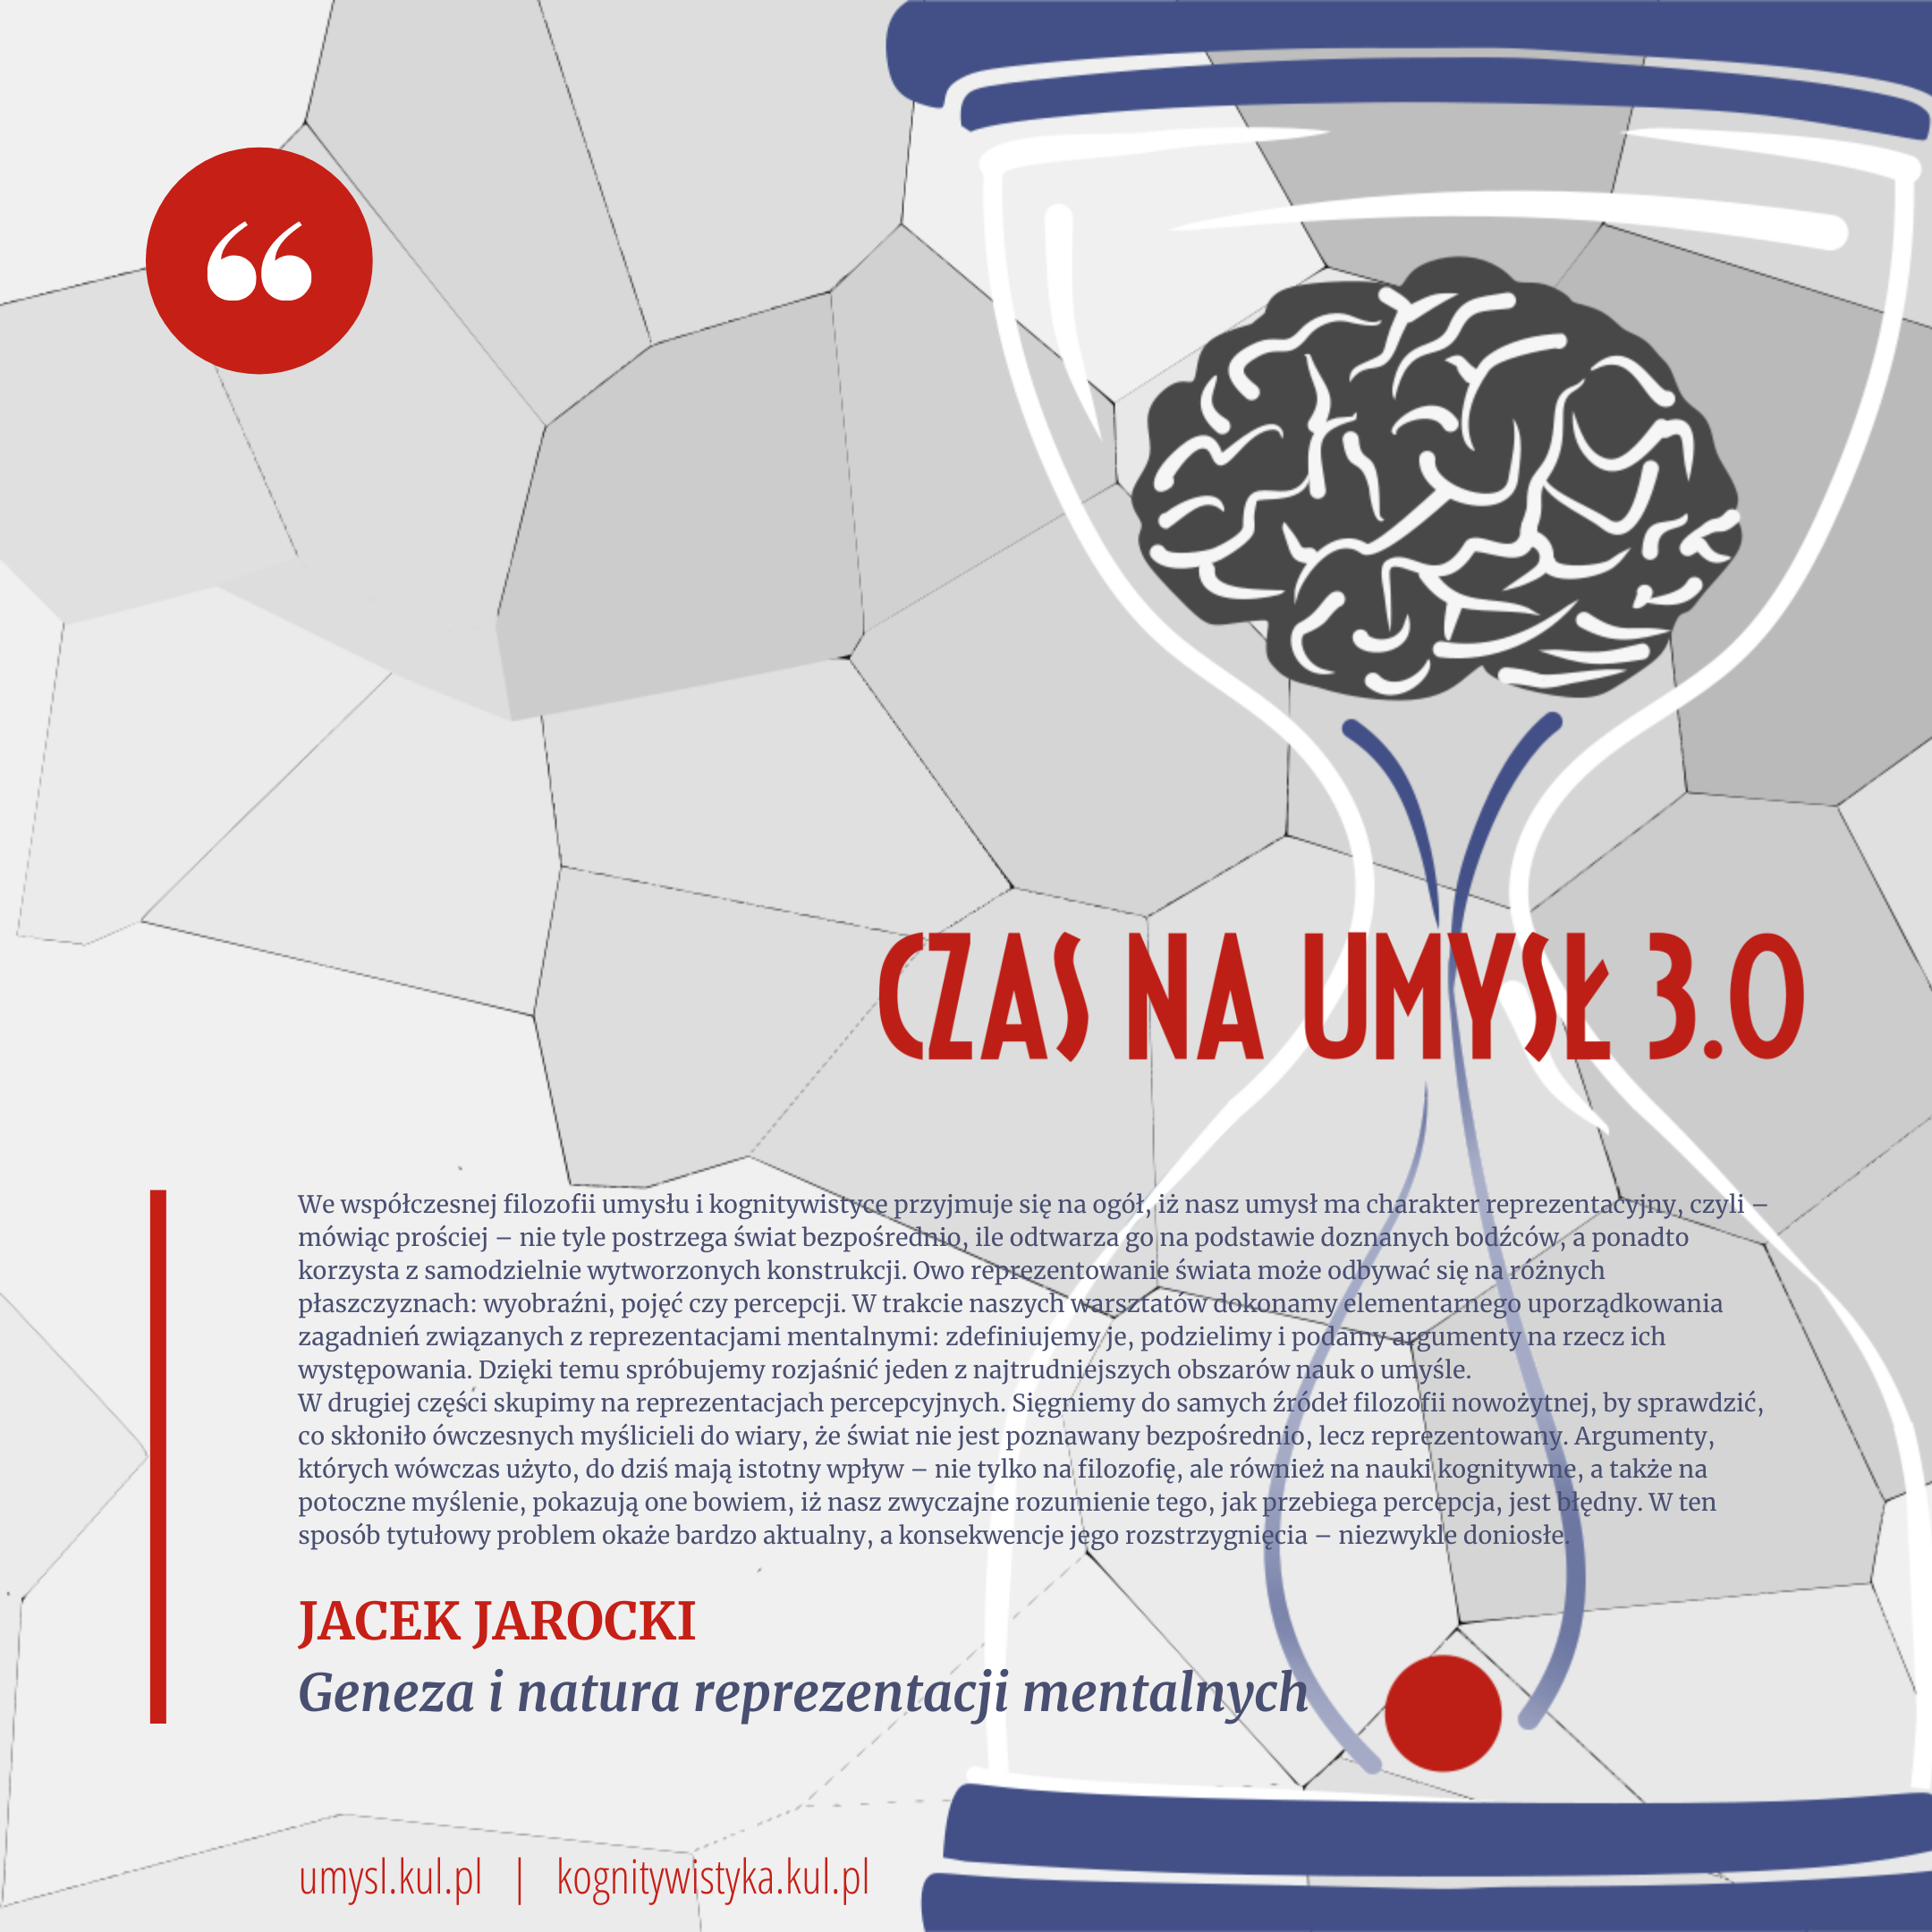 Jacek Jarocki - Geneza i natura reprezentacji mentalnych